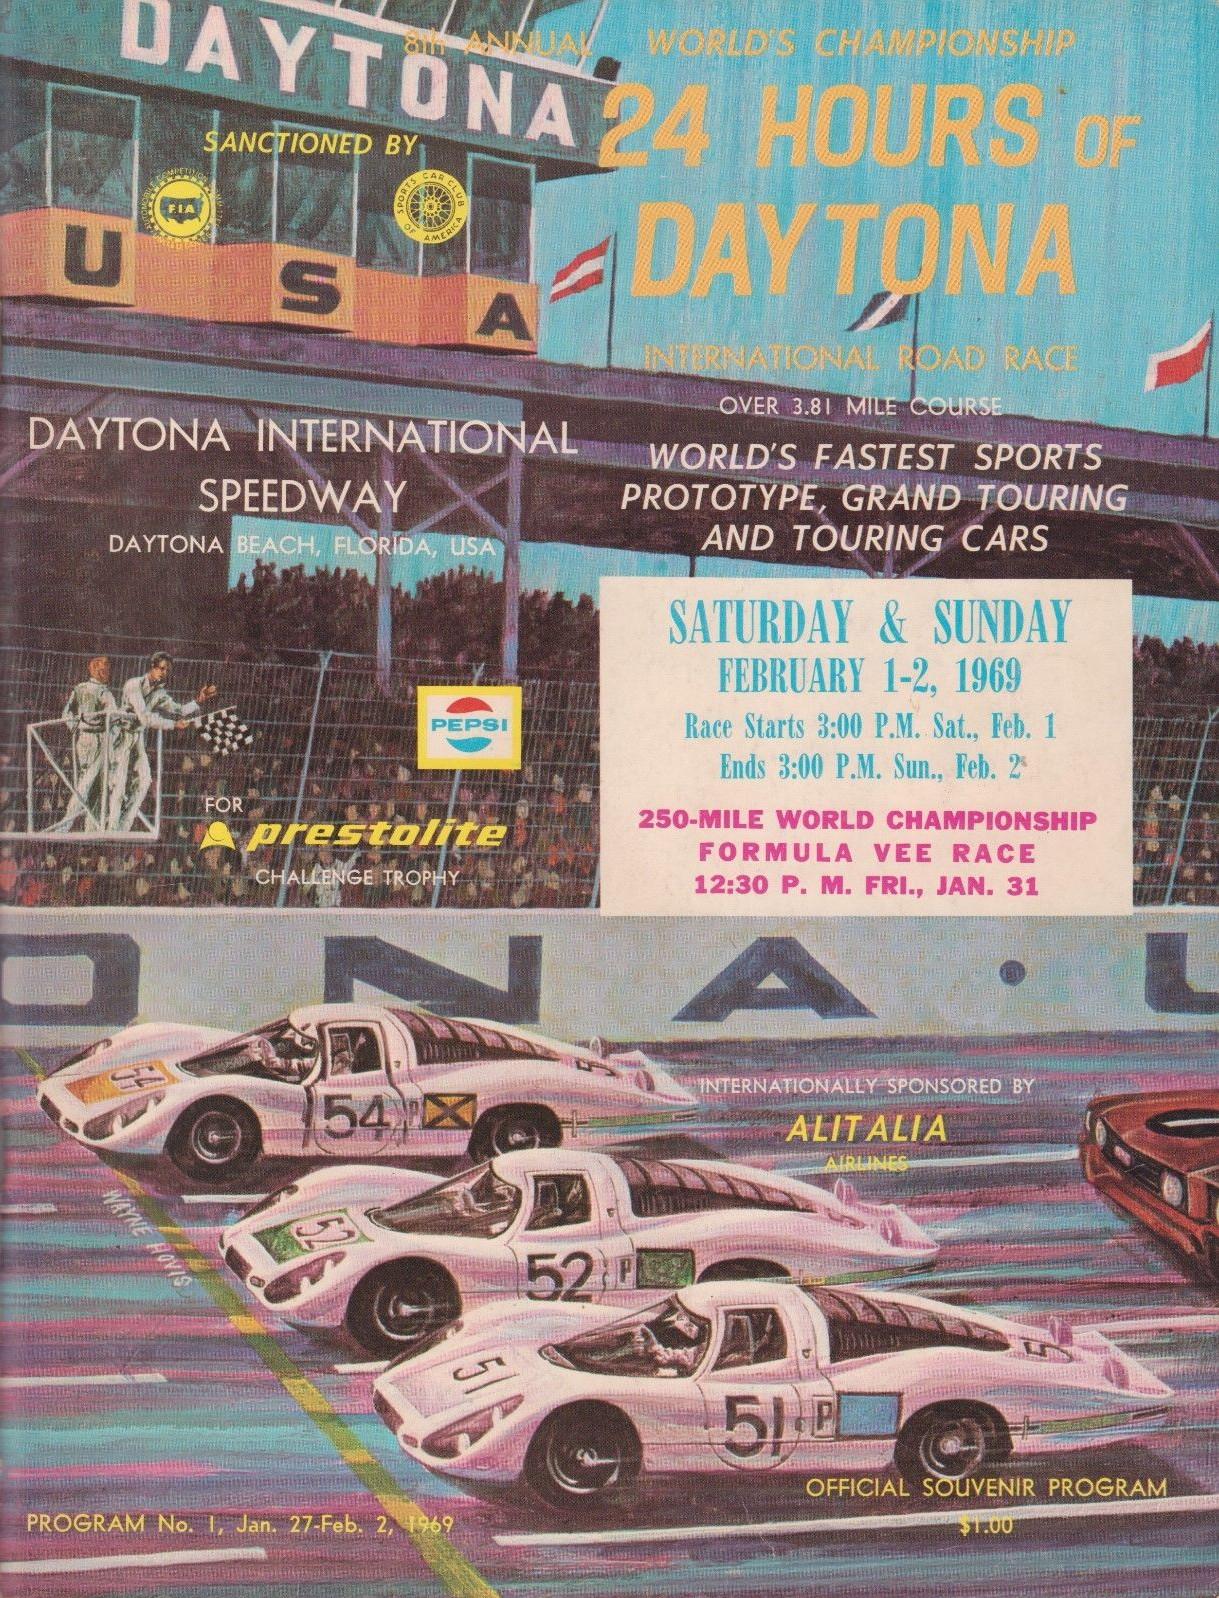 United States Grand Prix 1969 Daytona International Speedway Car Racing Poster